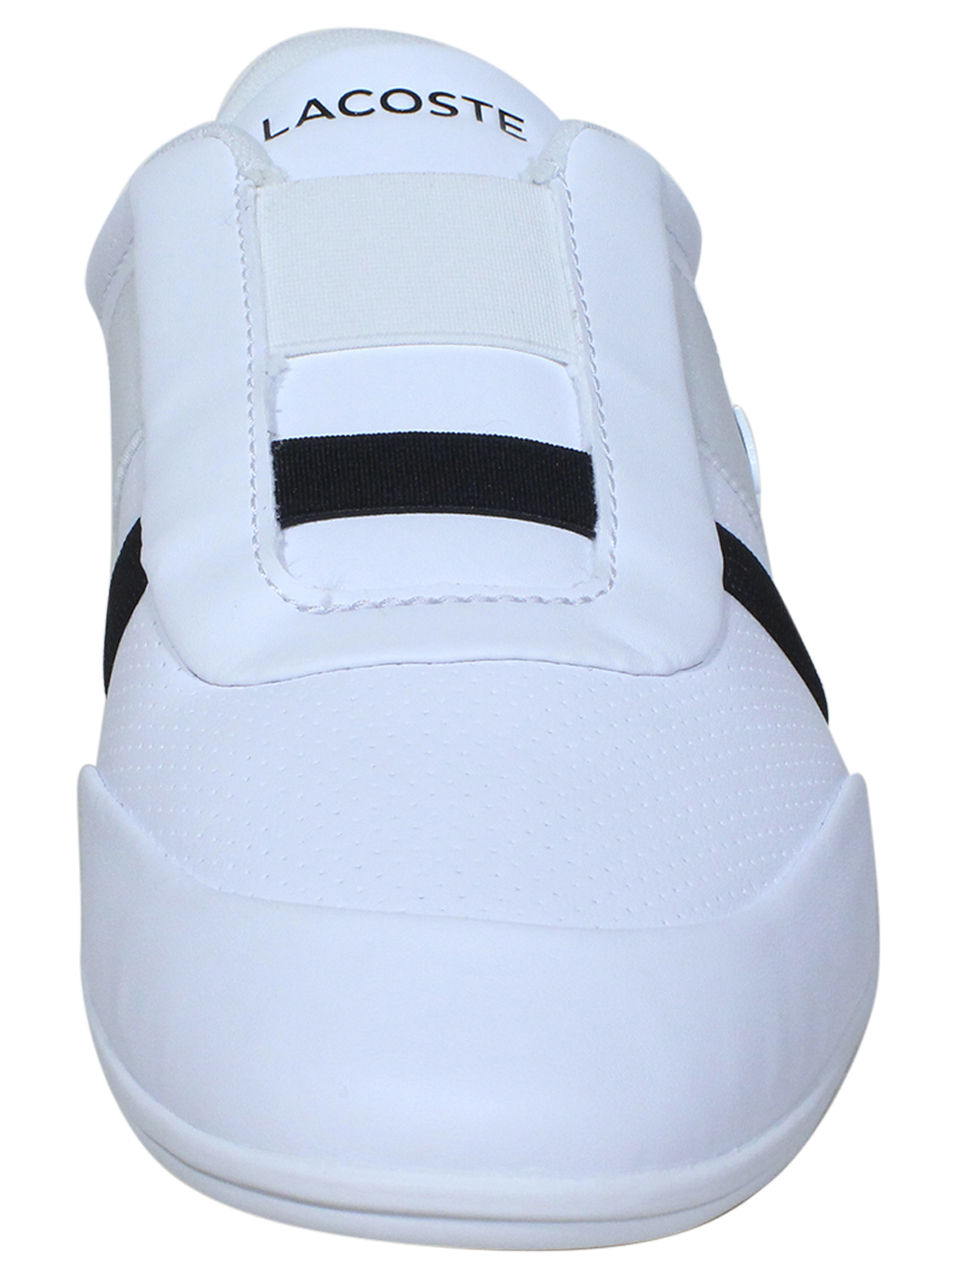 Lacoste-Misano-Elastic-318-Sneakers-Men-039-s-Low-Top-Shoes thumbnail 23